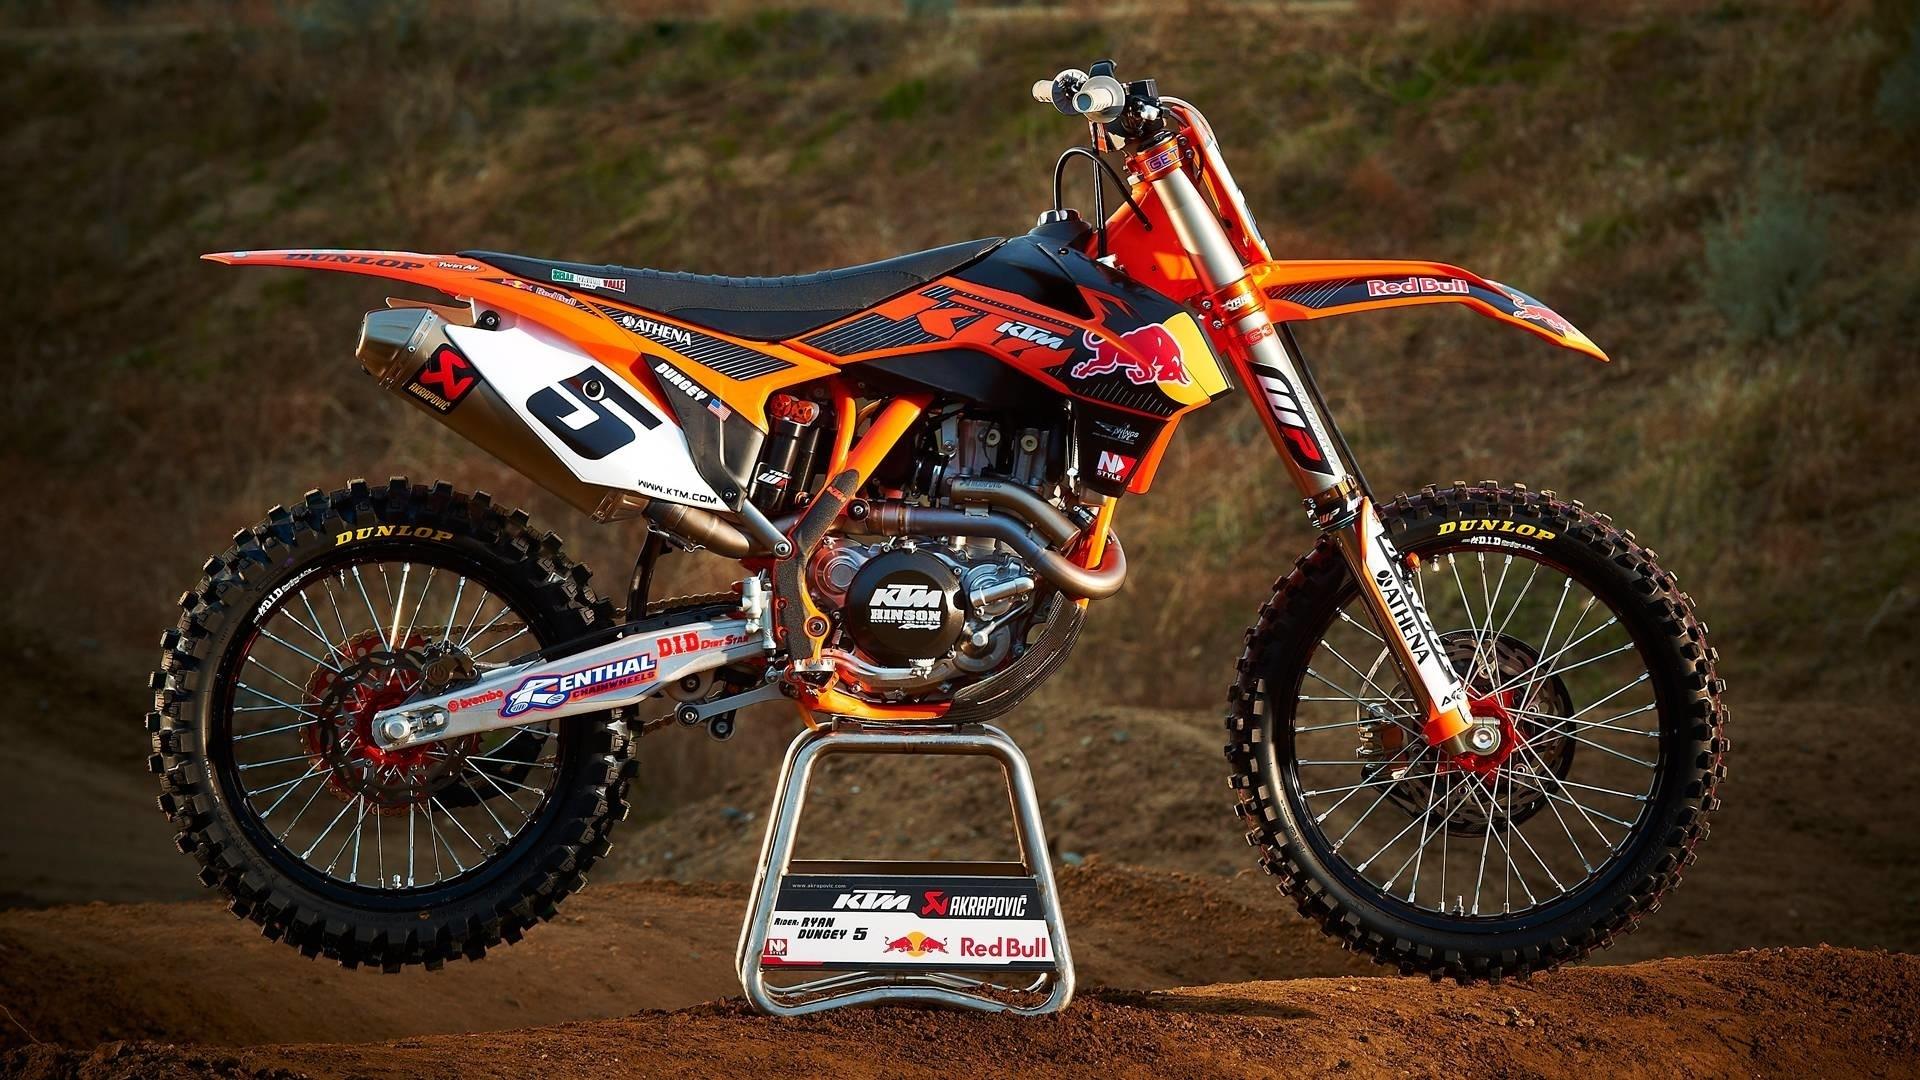 ktm wallpaper dirt bike (65+ images)